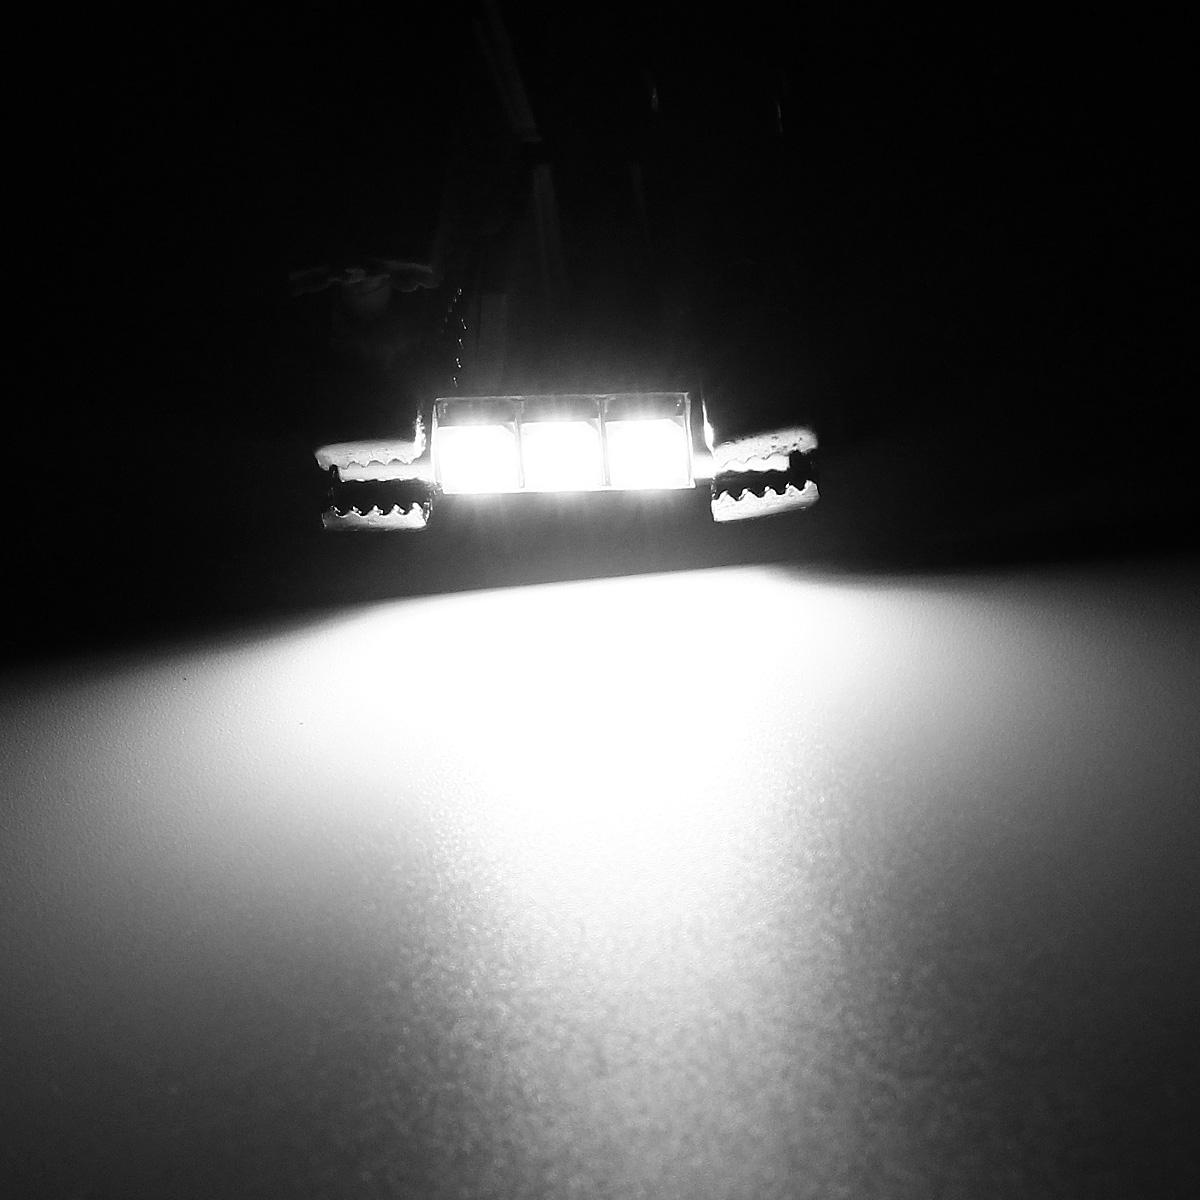 4pcs White 5050 3 LED Car Interior Vanity Mirror Lights Sun Visor Lamps 12V. 4pcs White 5050 3 LED Car Interior Vanity Mirror Lights Sun Visor